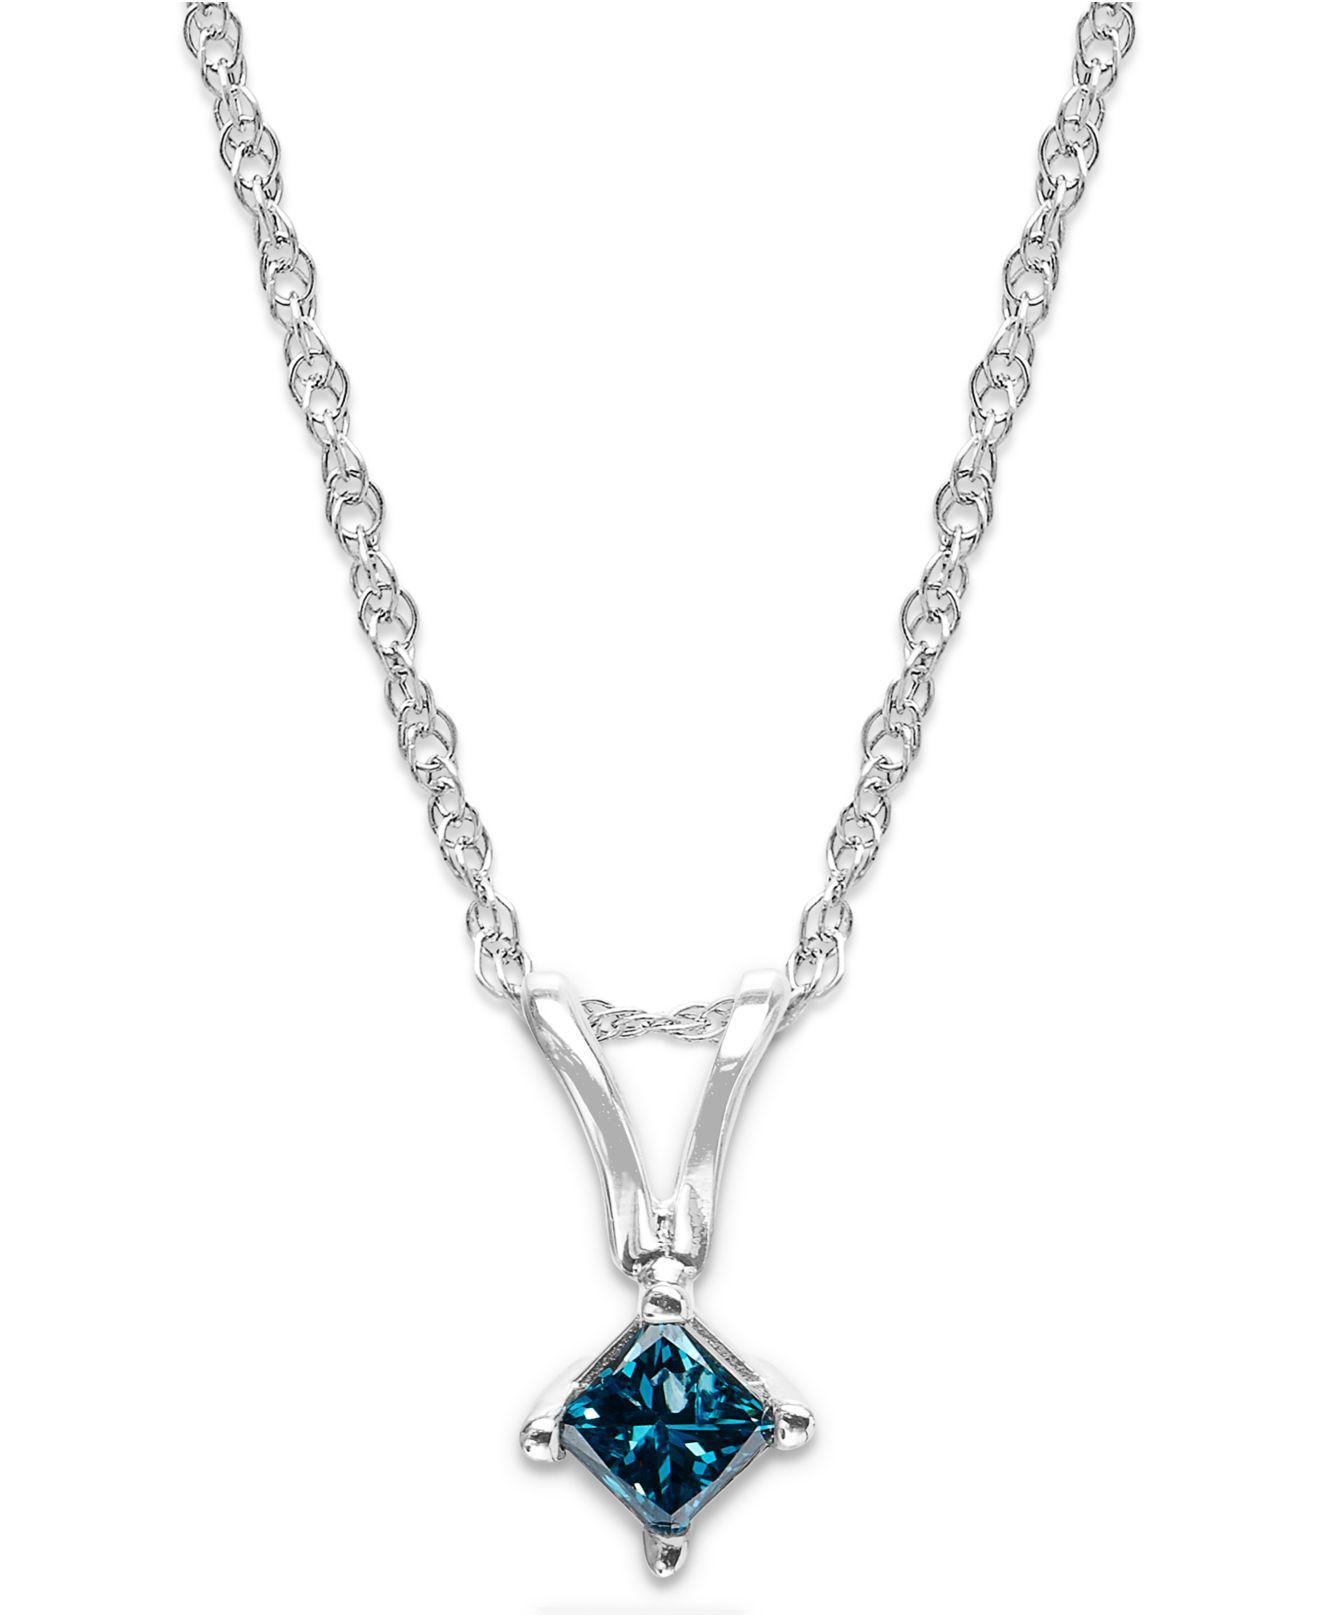 Lyst macys 10k white gold blue diamond pendant necklace 110 ct macys womens metallic 10k white gold blue diamond pendant necklace aloadofball Image collections